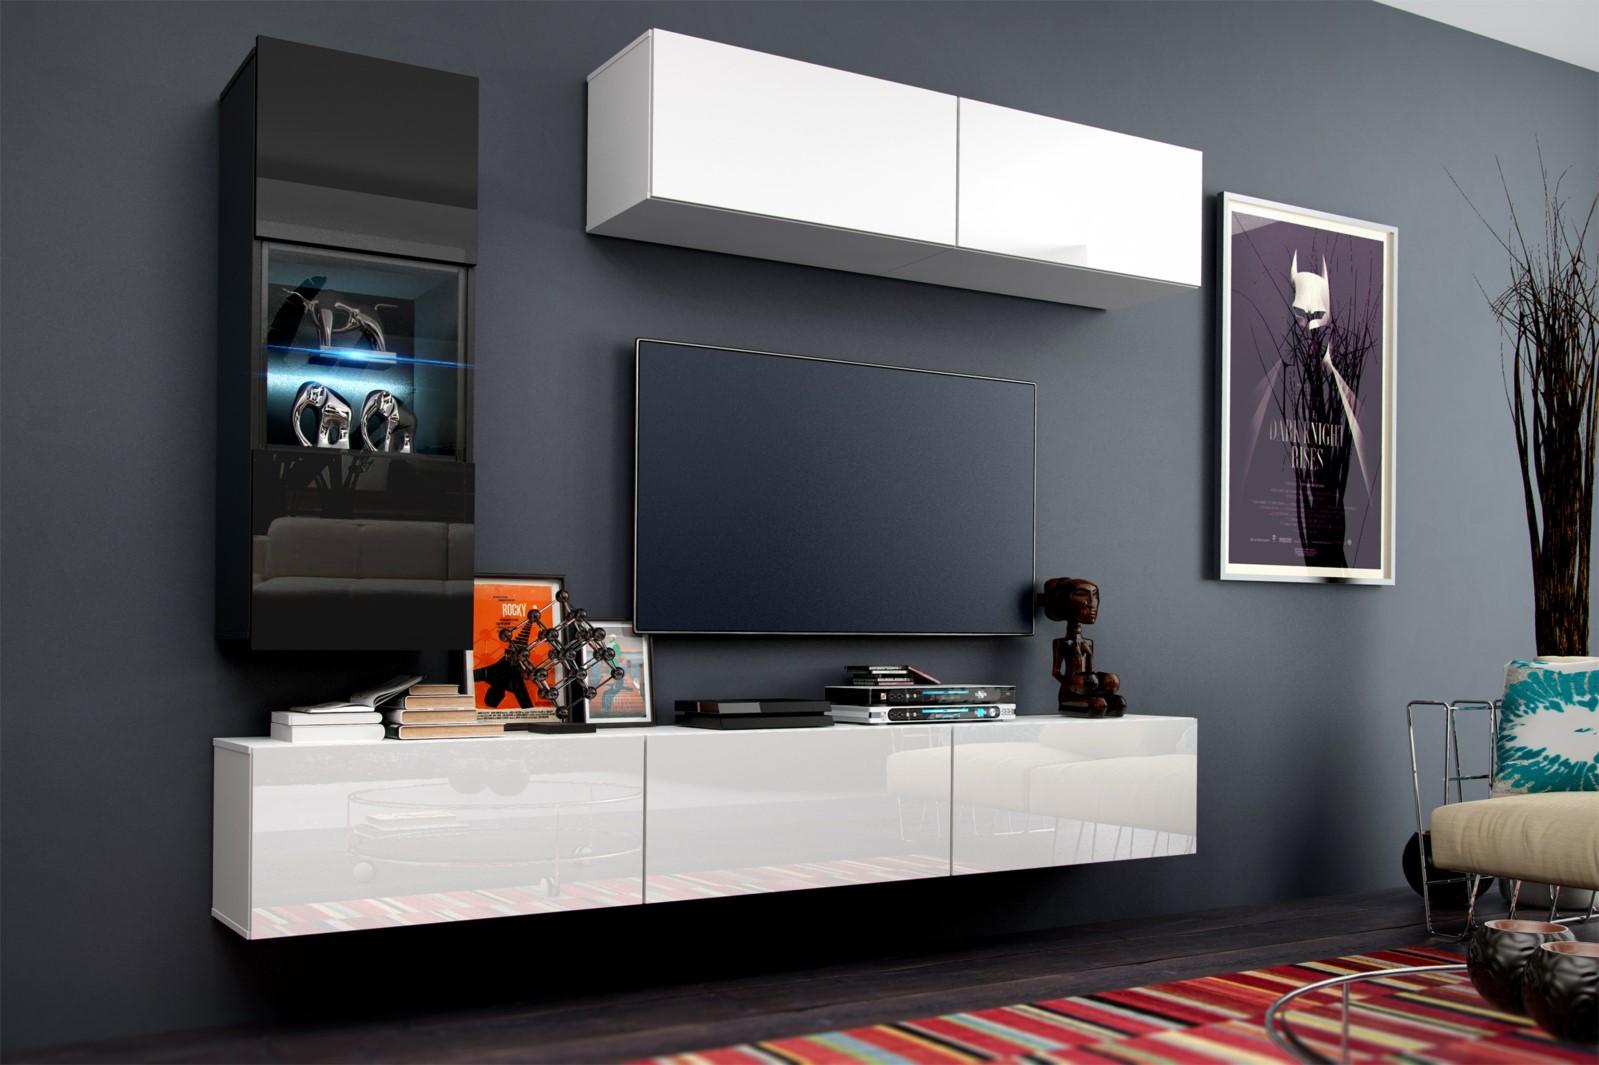 Mediawand Wohnwand 6 Tlg   Konzept 12   Weiss HGL Mit LED Beleuchtung